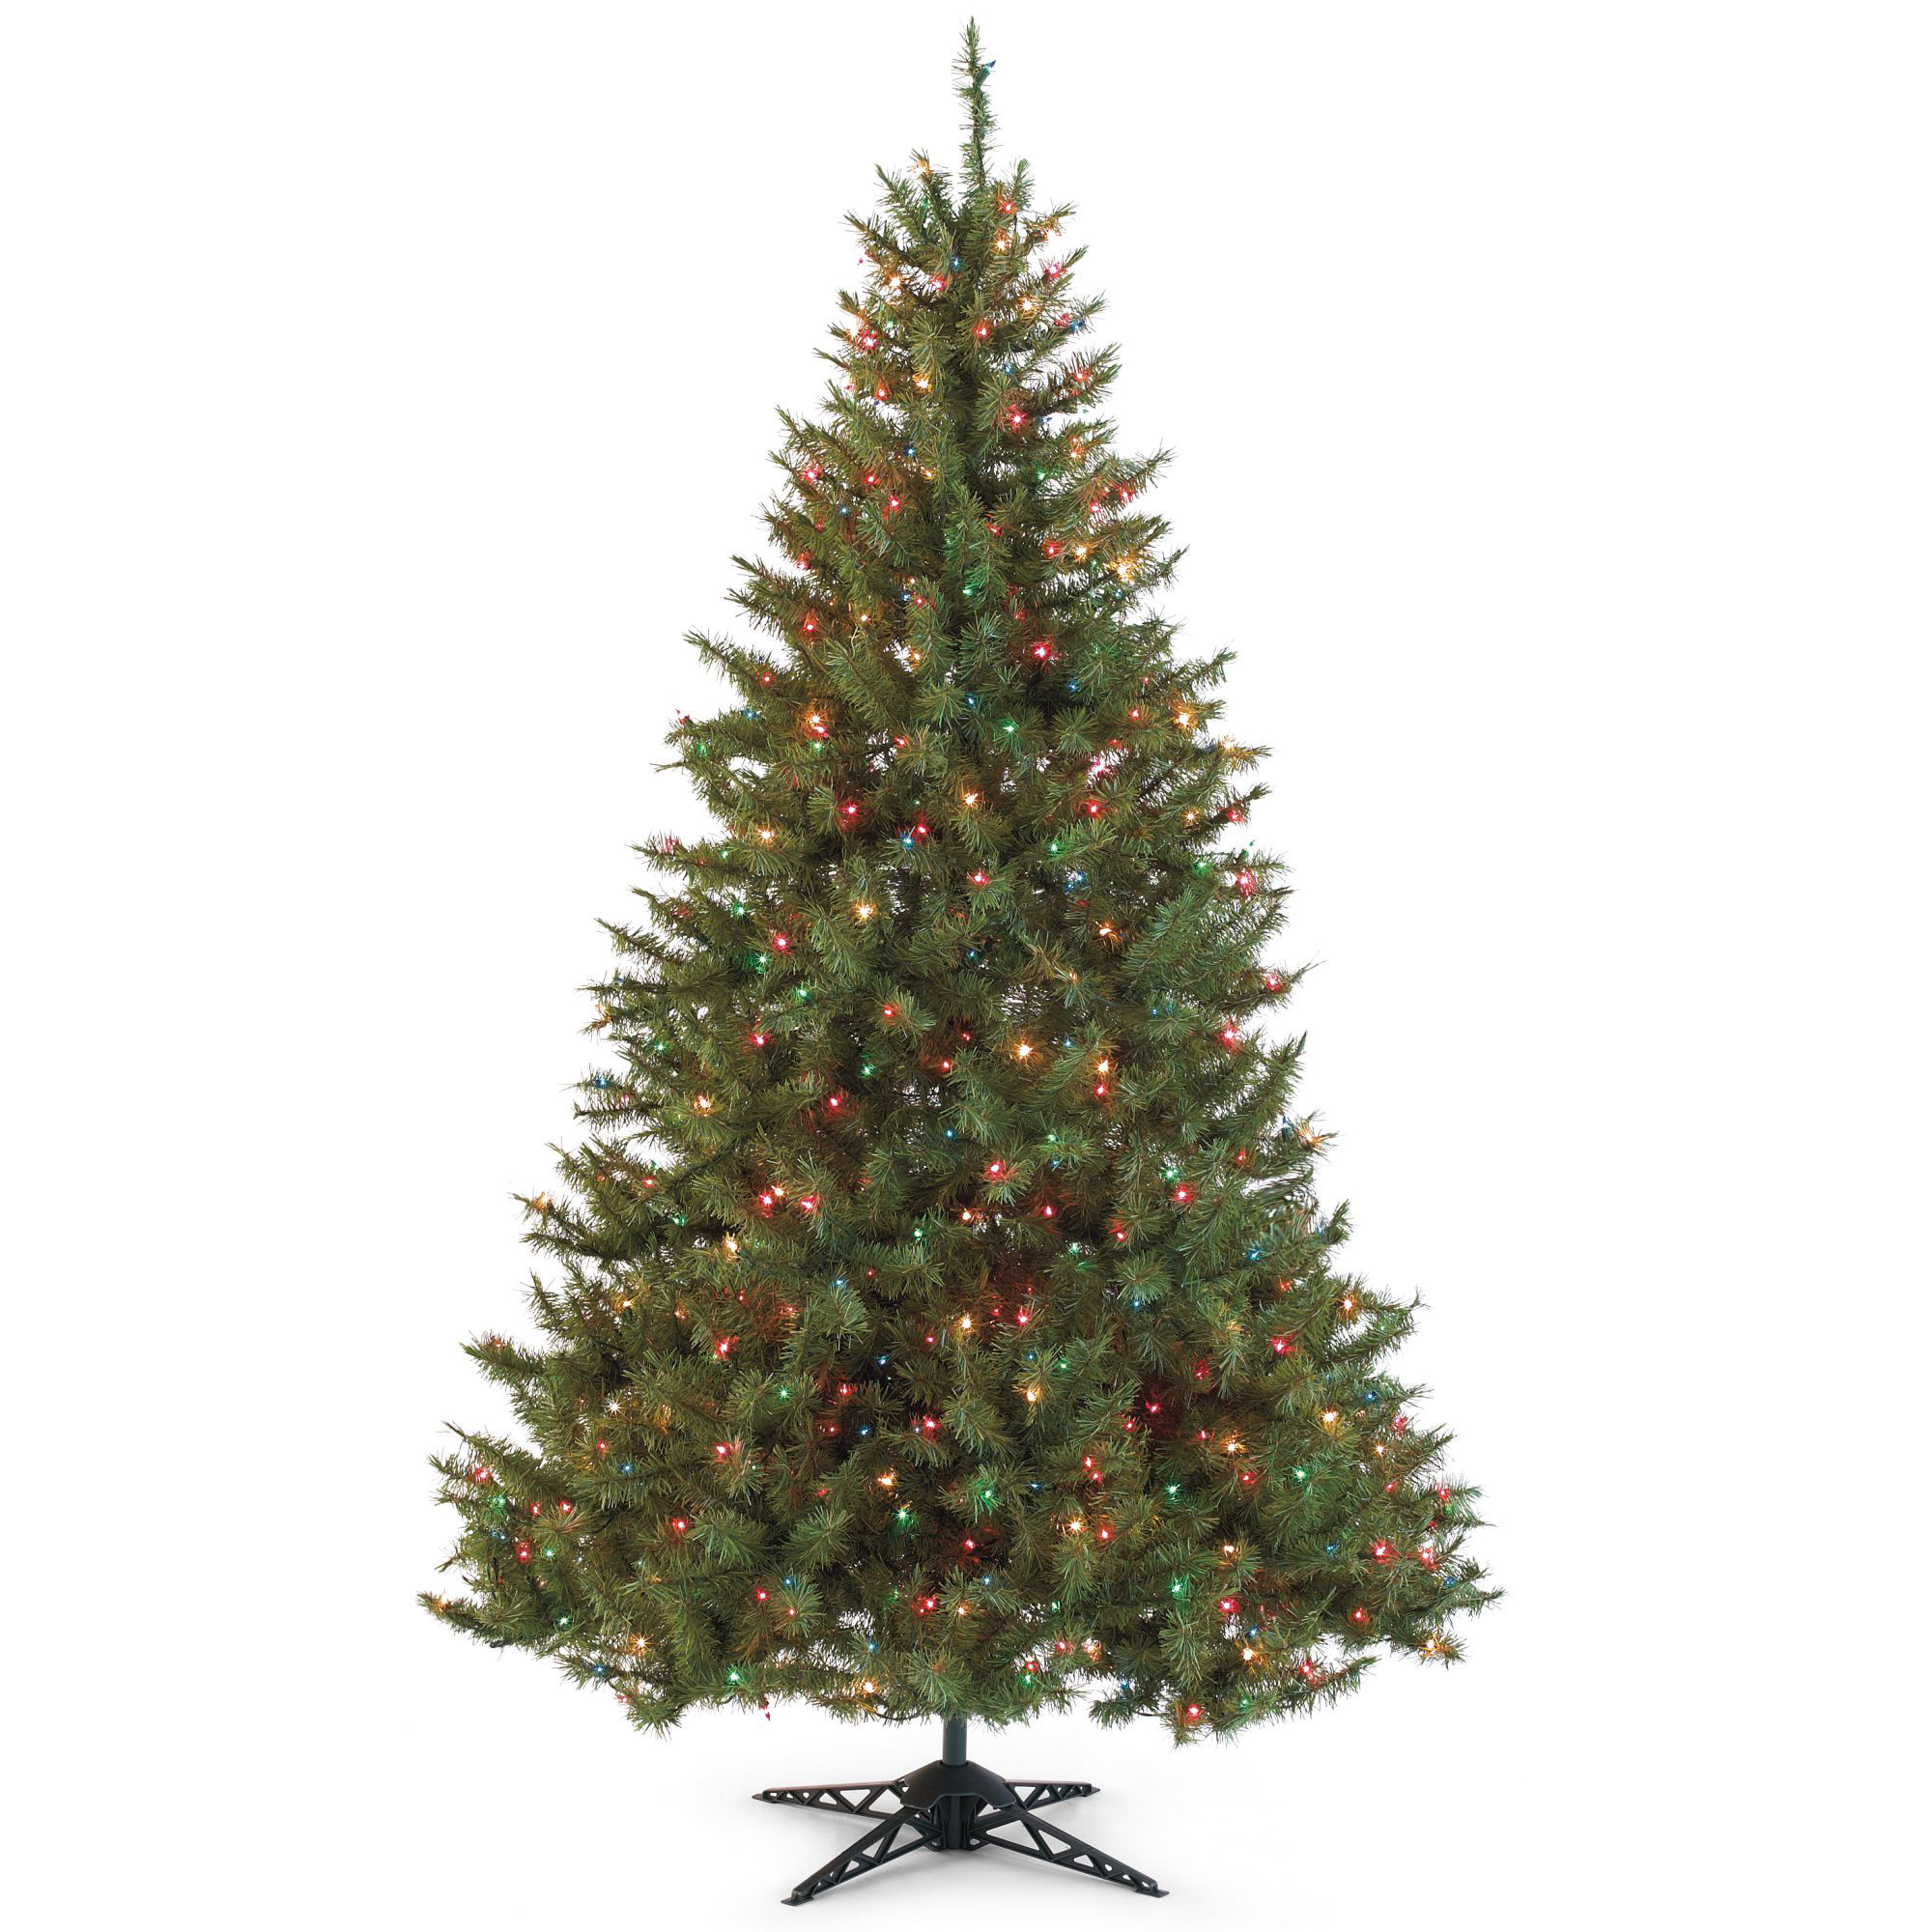 7 Foot Slim Pre Lit Christmas Trees